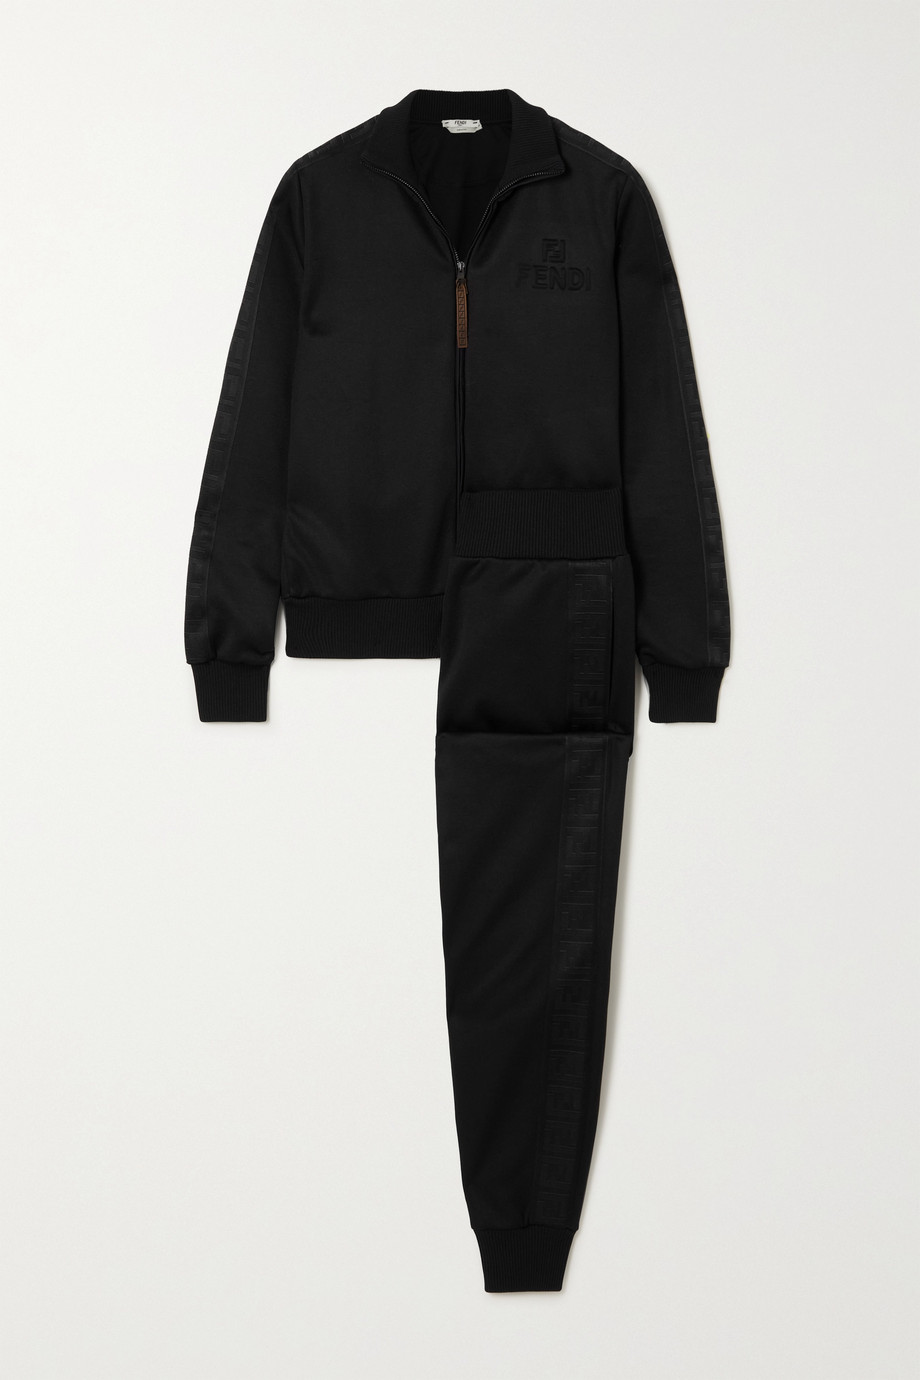 Fendi Trainingsanzug aus Jersey-Piqué mit Prägung